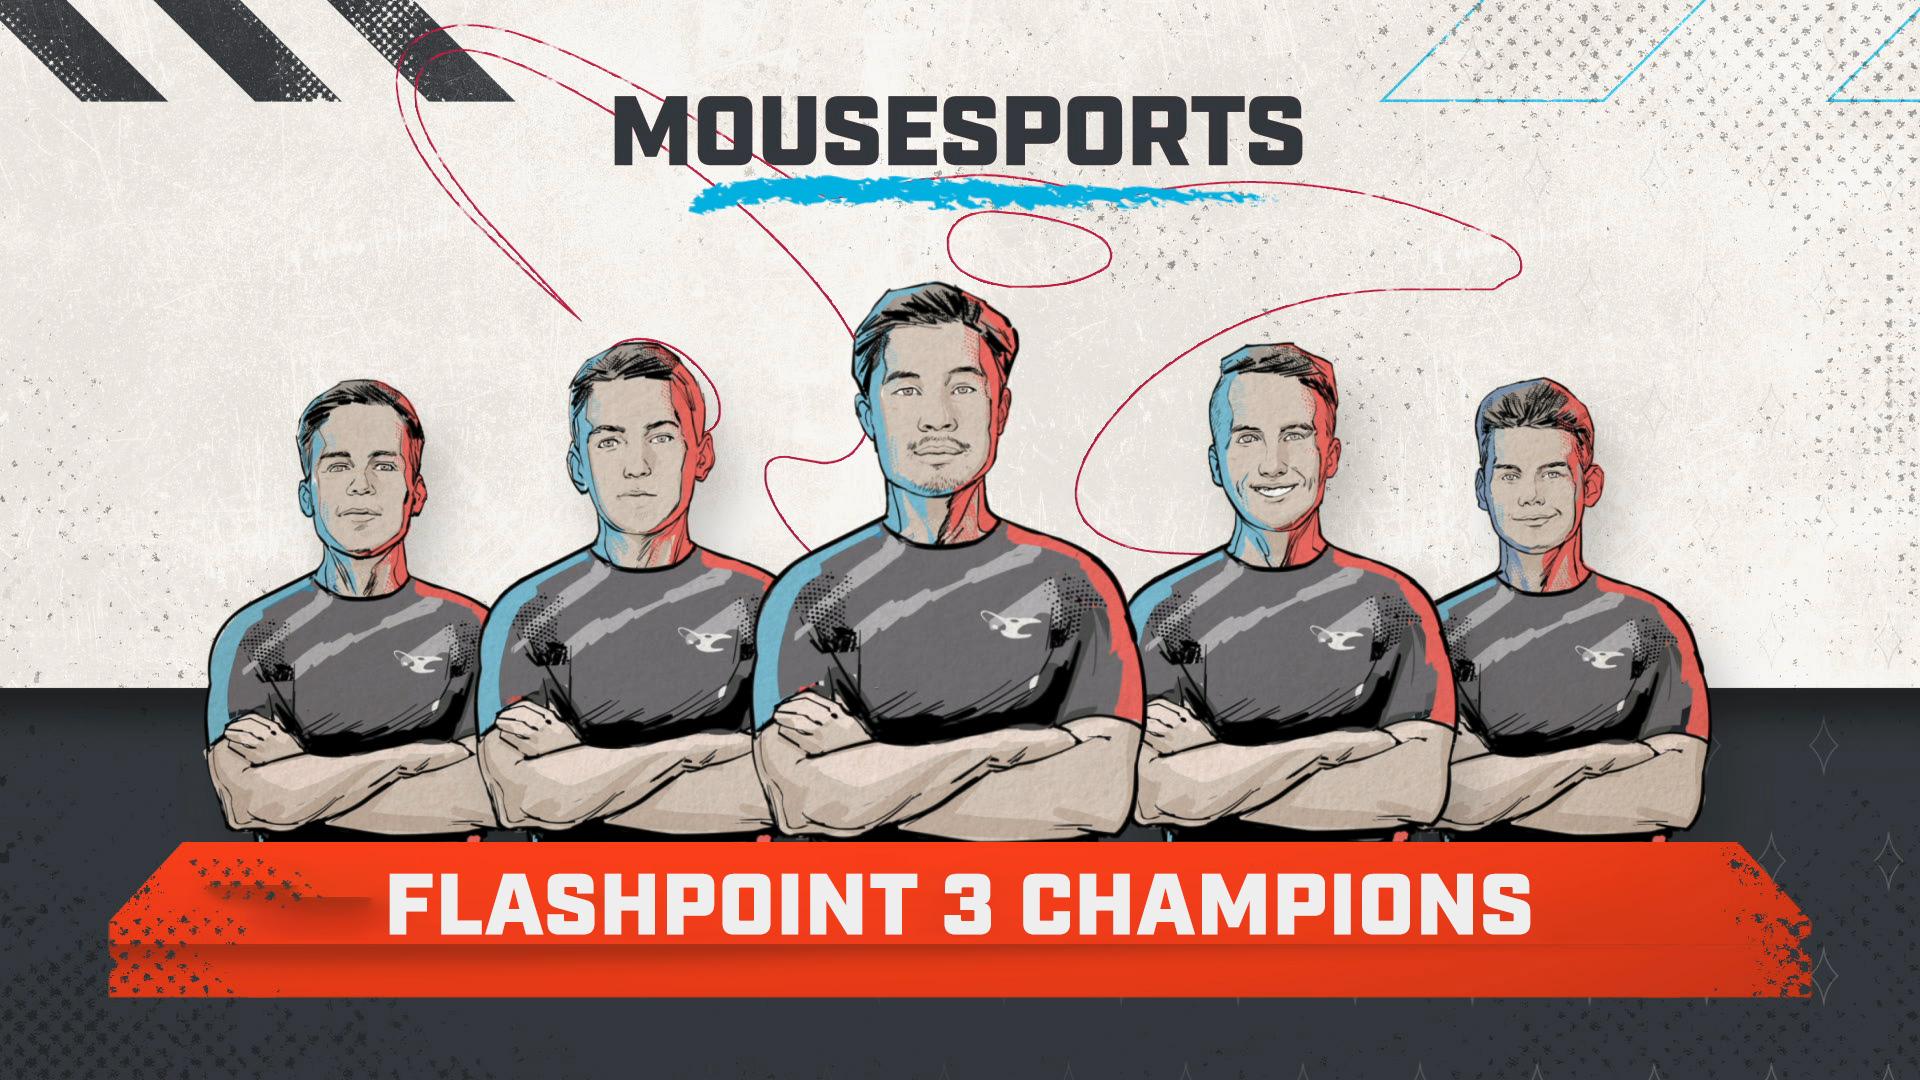 mousesports champion saison 3 flashpoint